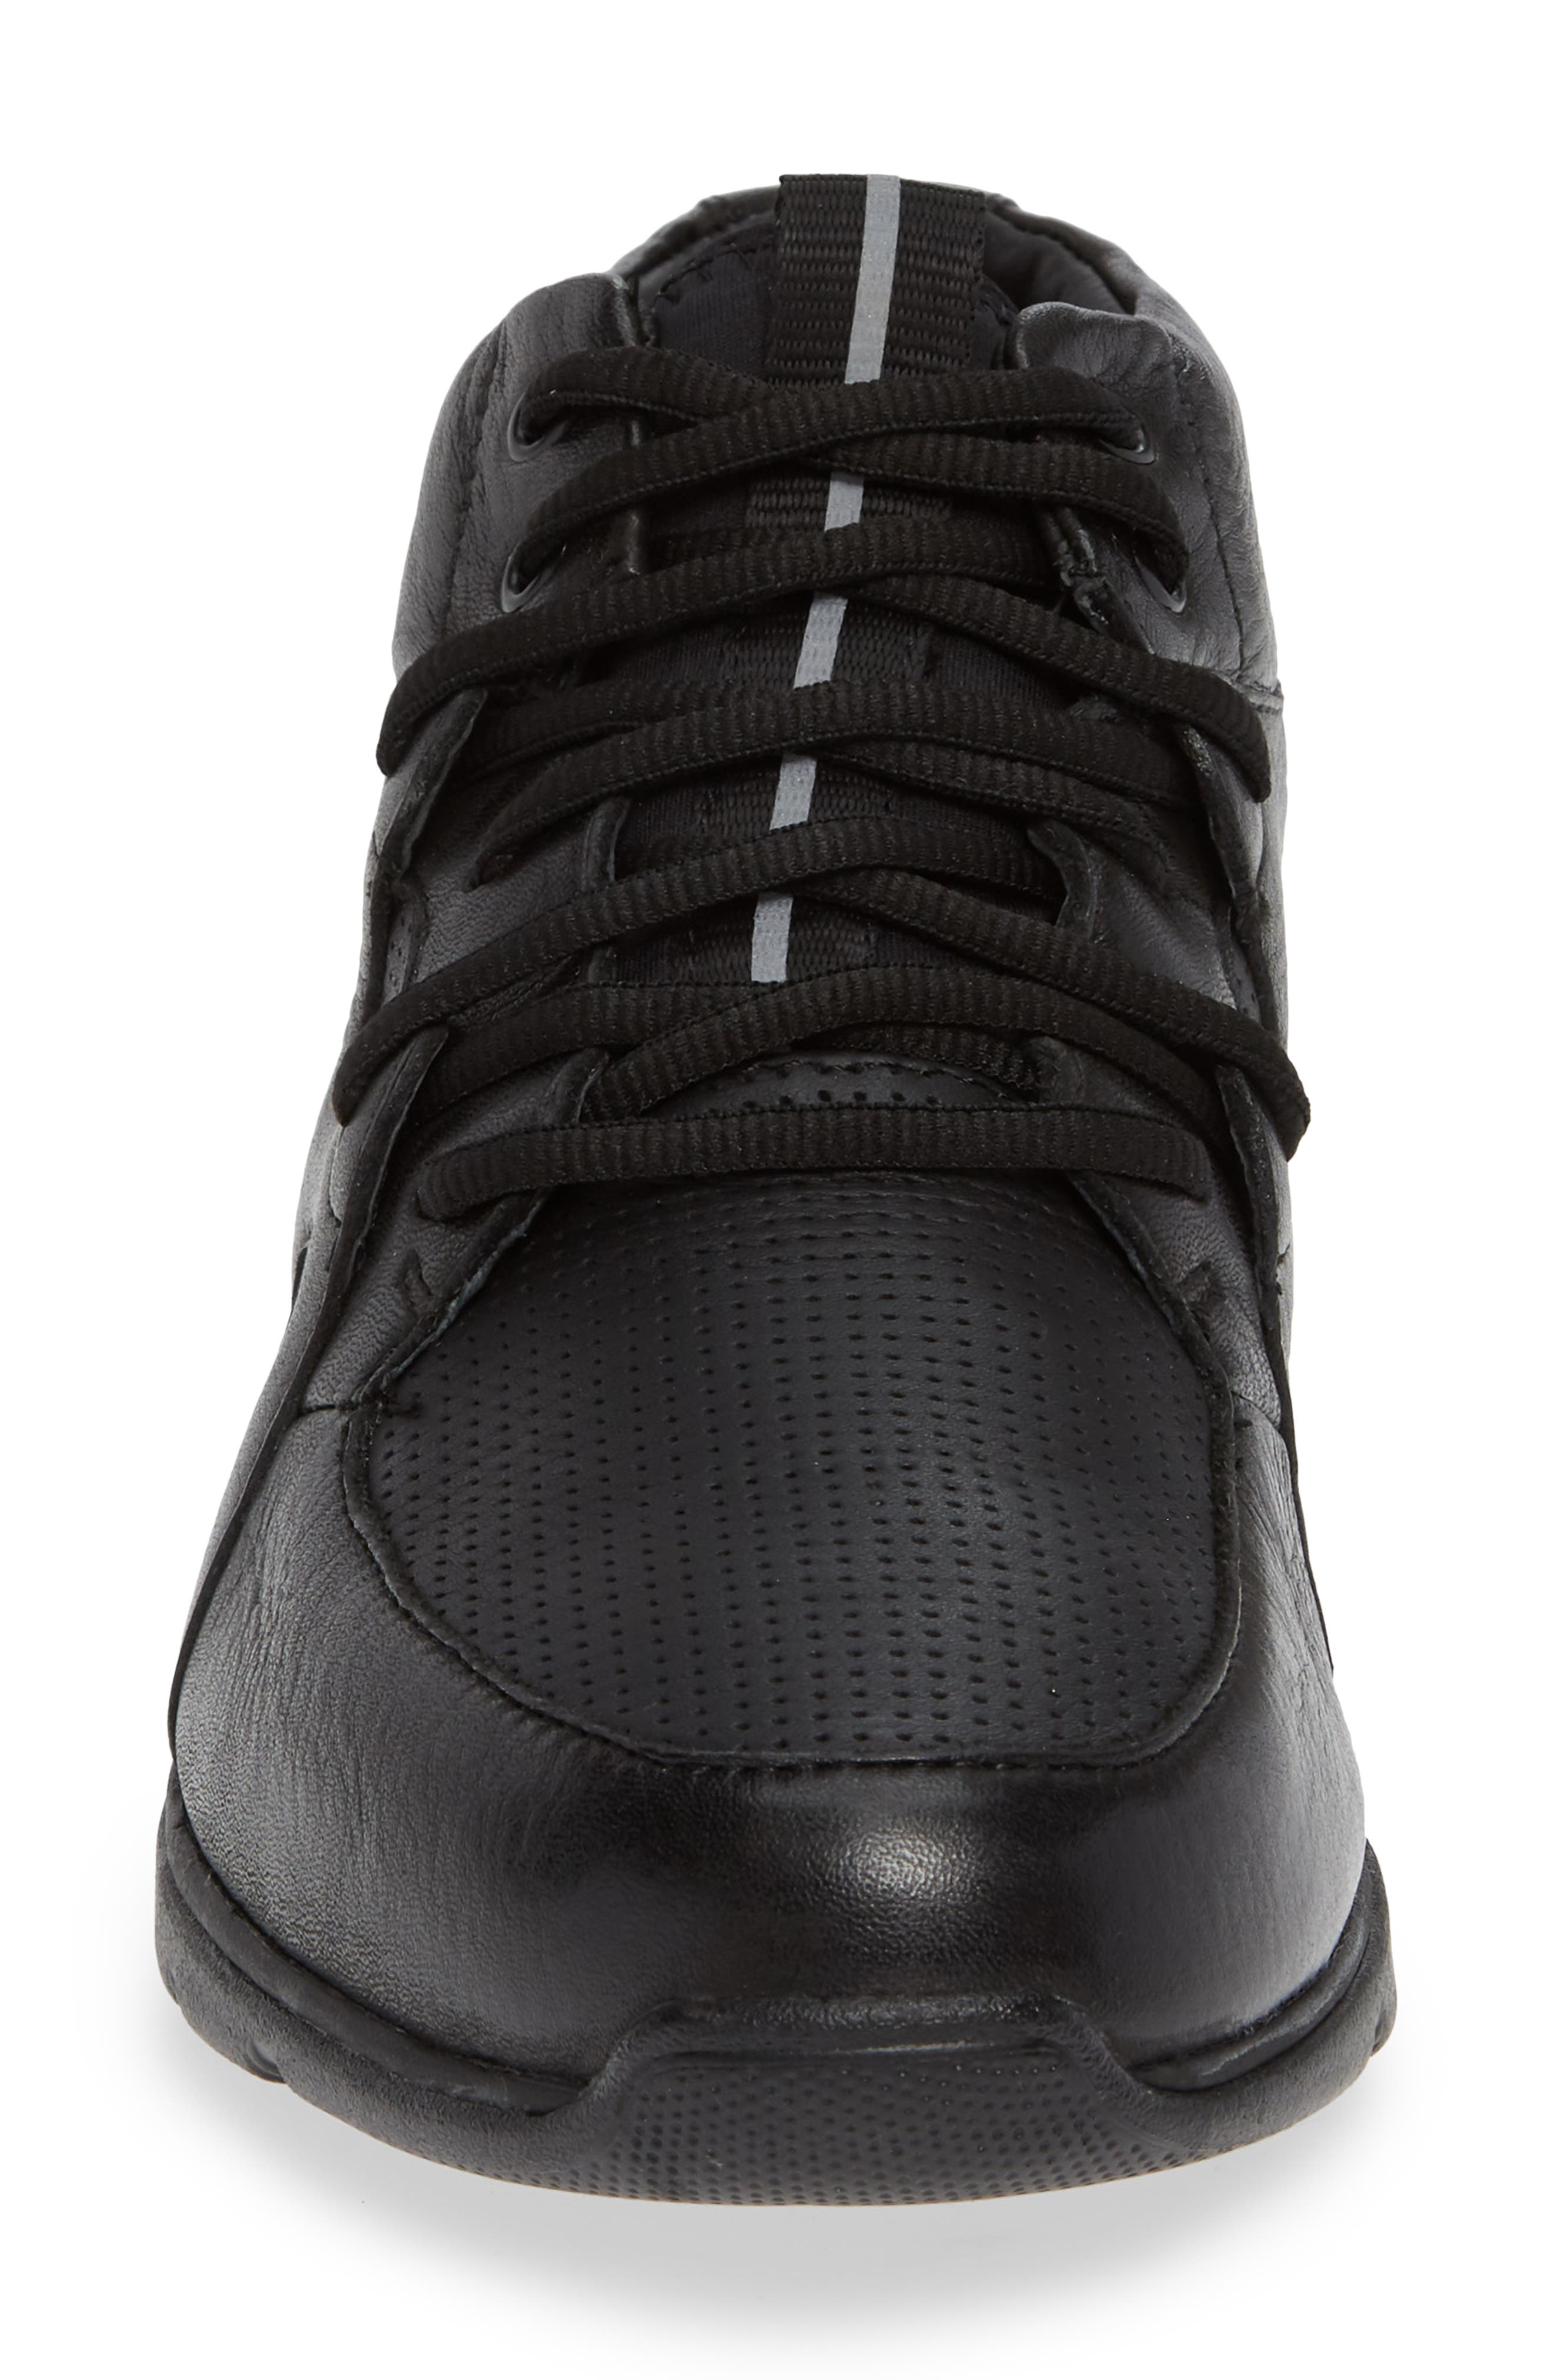 Prentiss Waterproof Sneaker,                             Alternate thumbnail 4, color,                             BLACK LEATHER